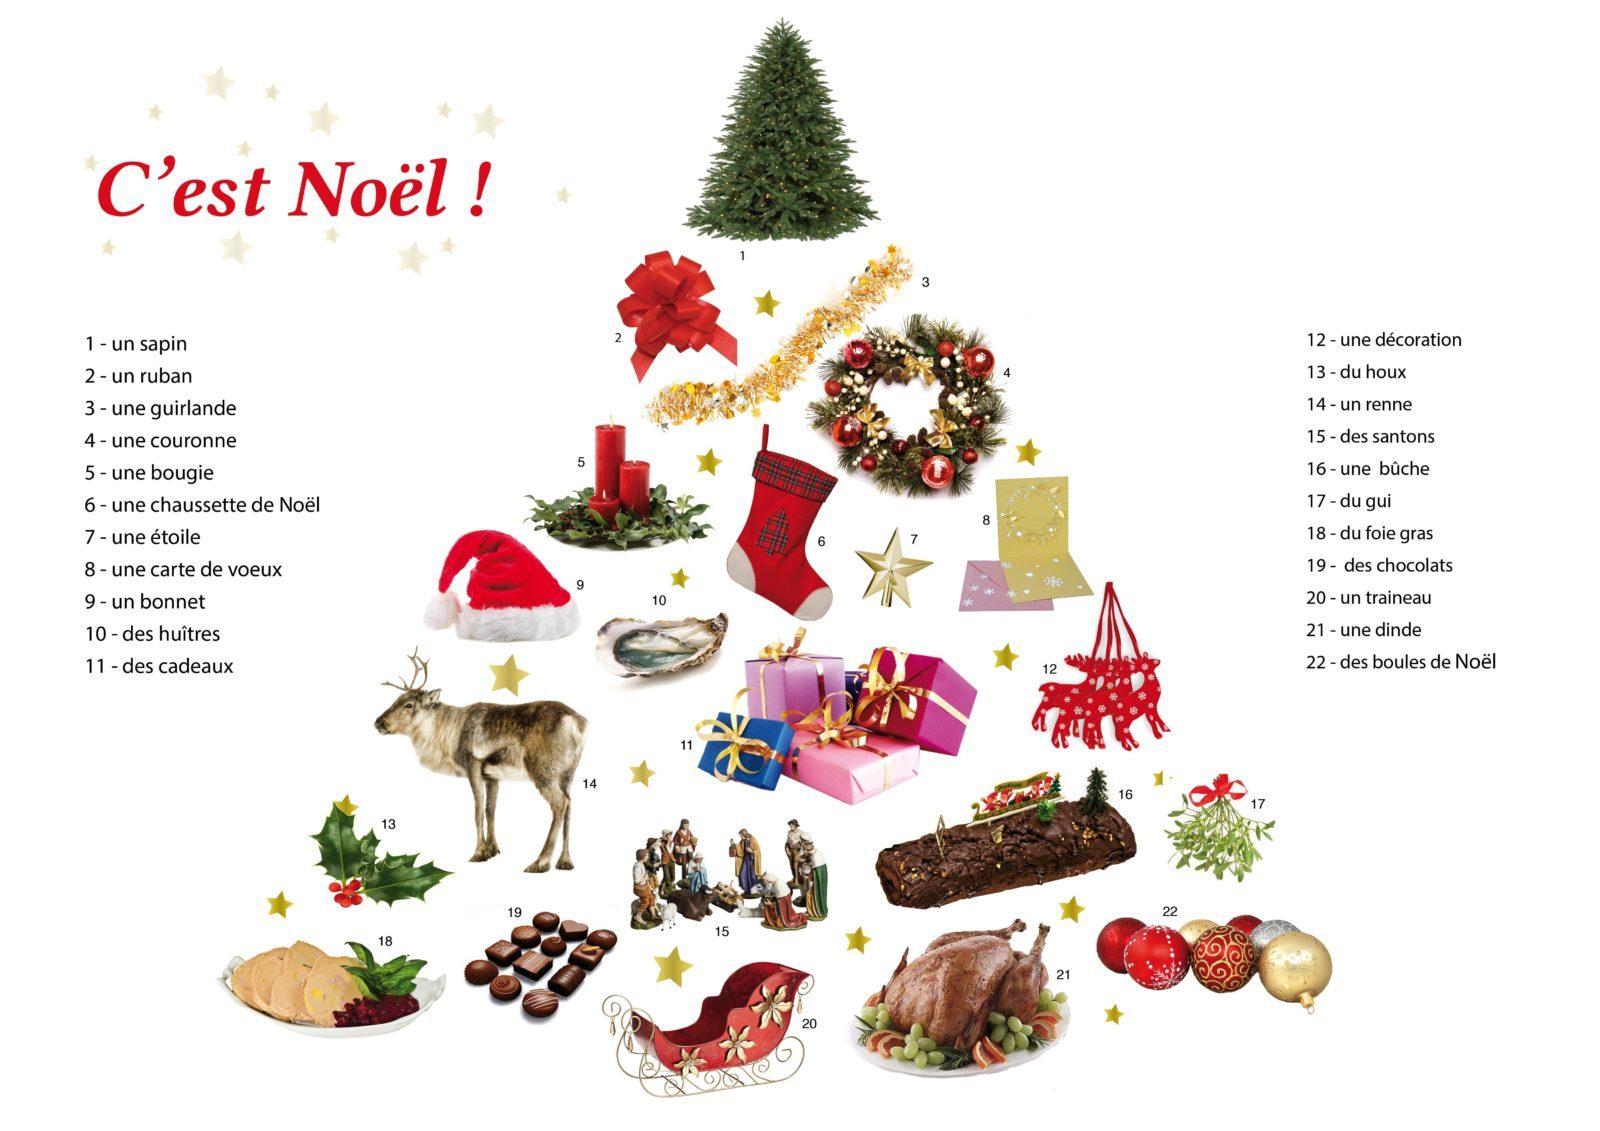 Традиции празднования Рождества во Франции